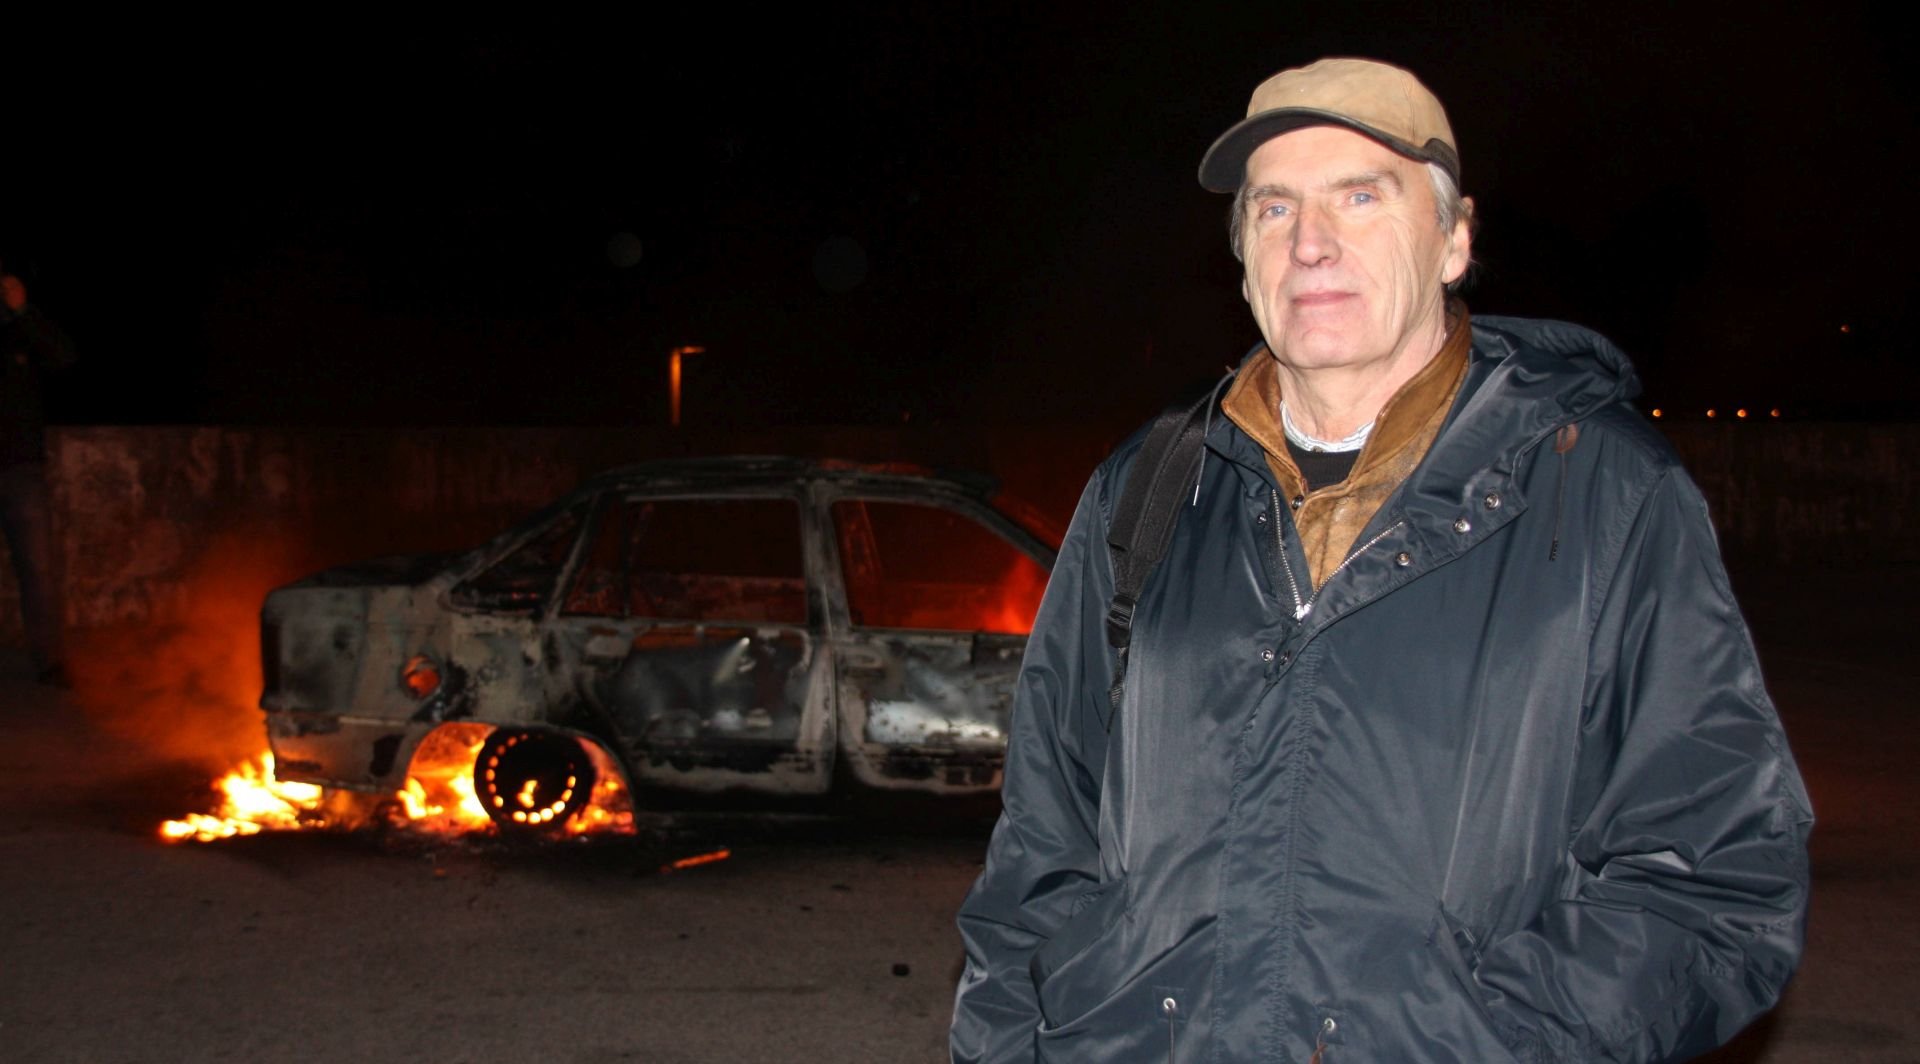 """Vječna vatra gnjeva"" – Dalibor Martinis u dubrovačkom predgrađu Mokošica zapalio automobil"